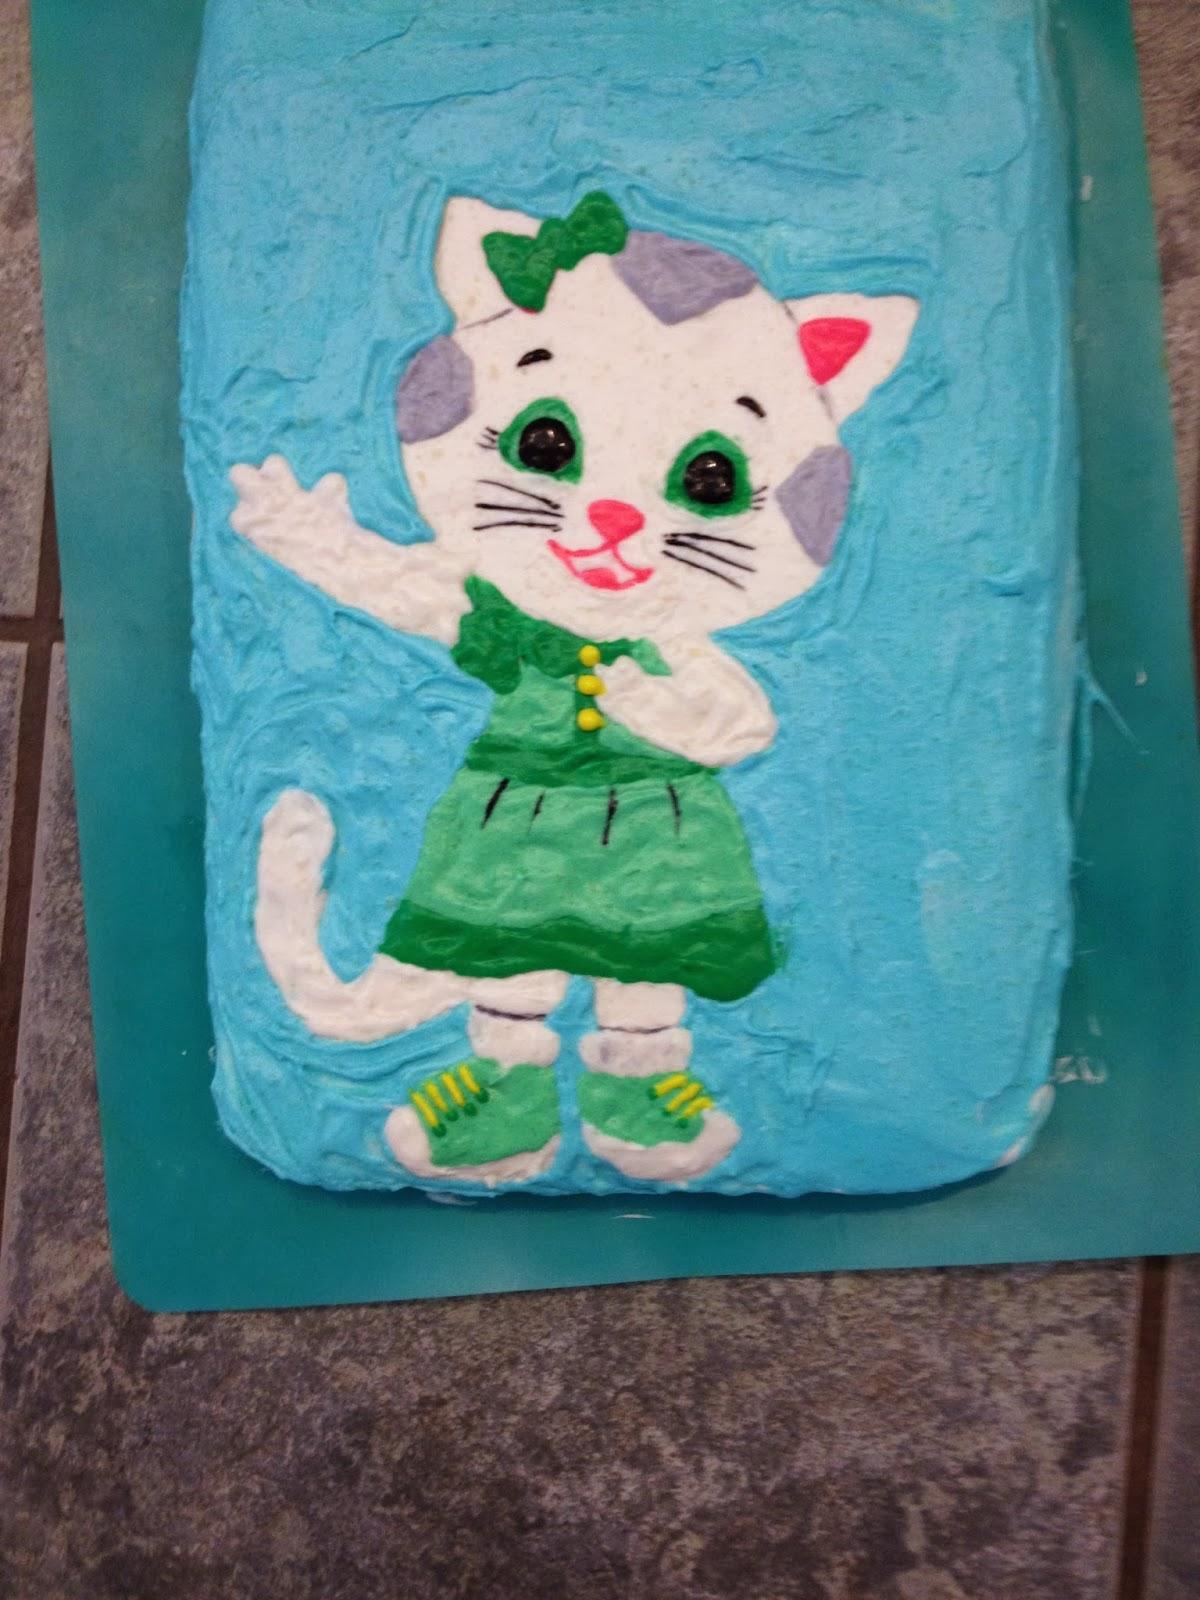 Threads On The Floor Birthdays Babies Cookies And Cake